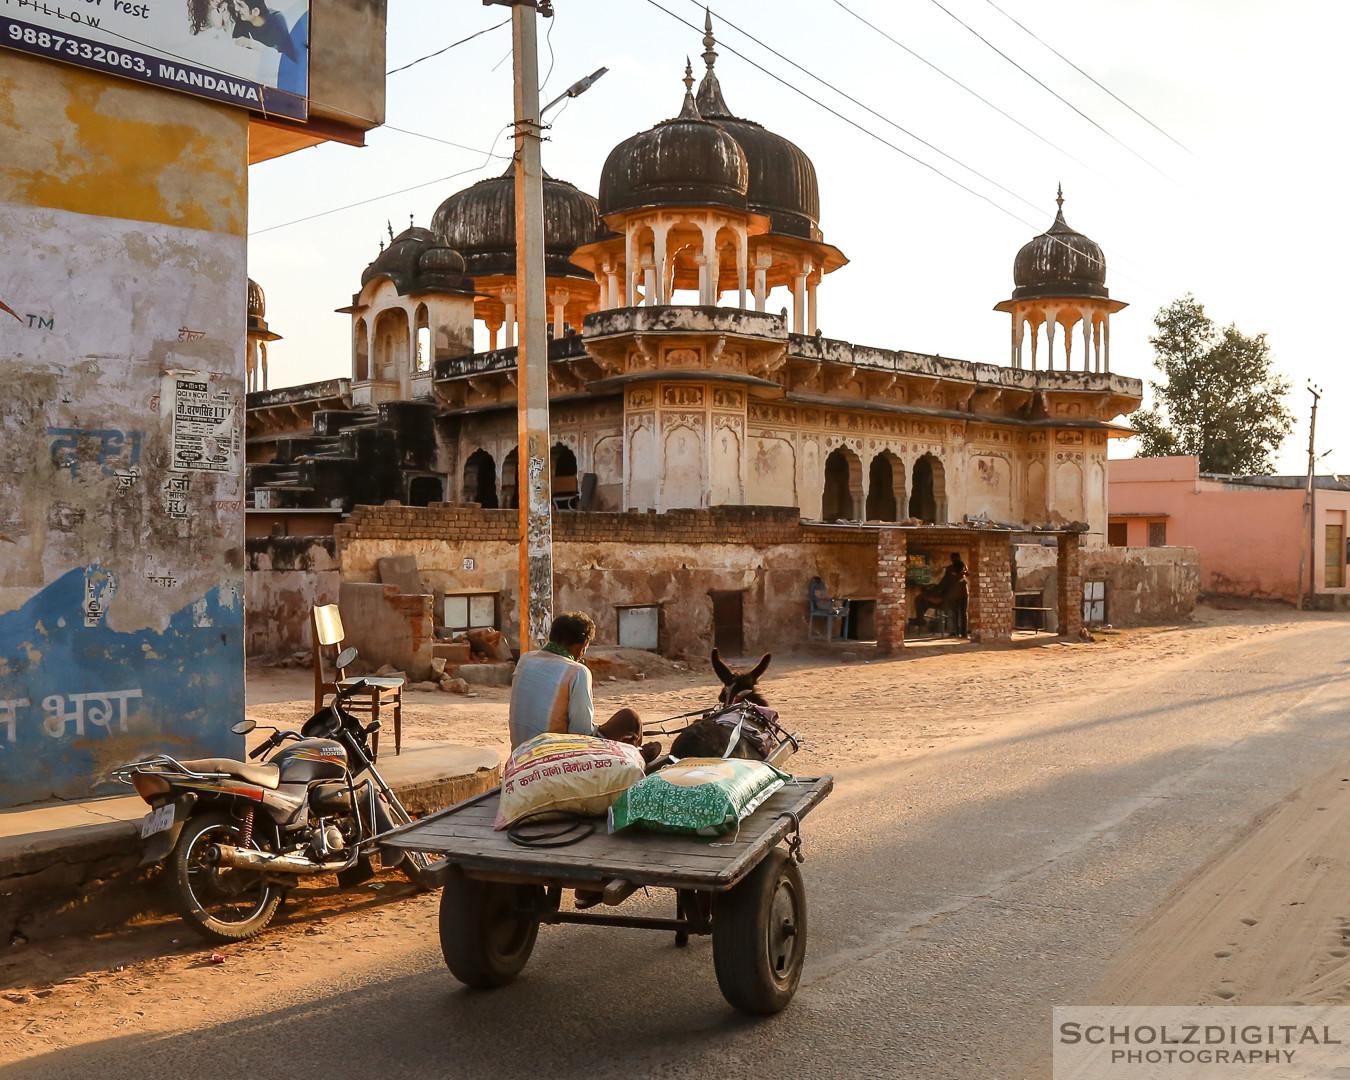 Indien, India, Streetphotography, Rundreise, Rajasthan, Wüste, Streetlife, Mandawa, Haveli, Kaufmannspaläste